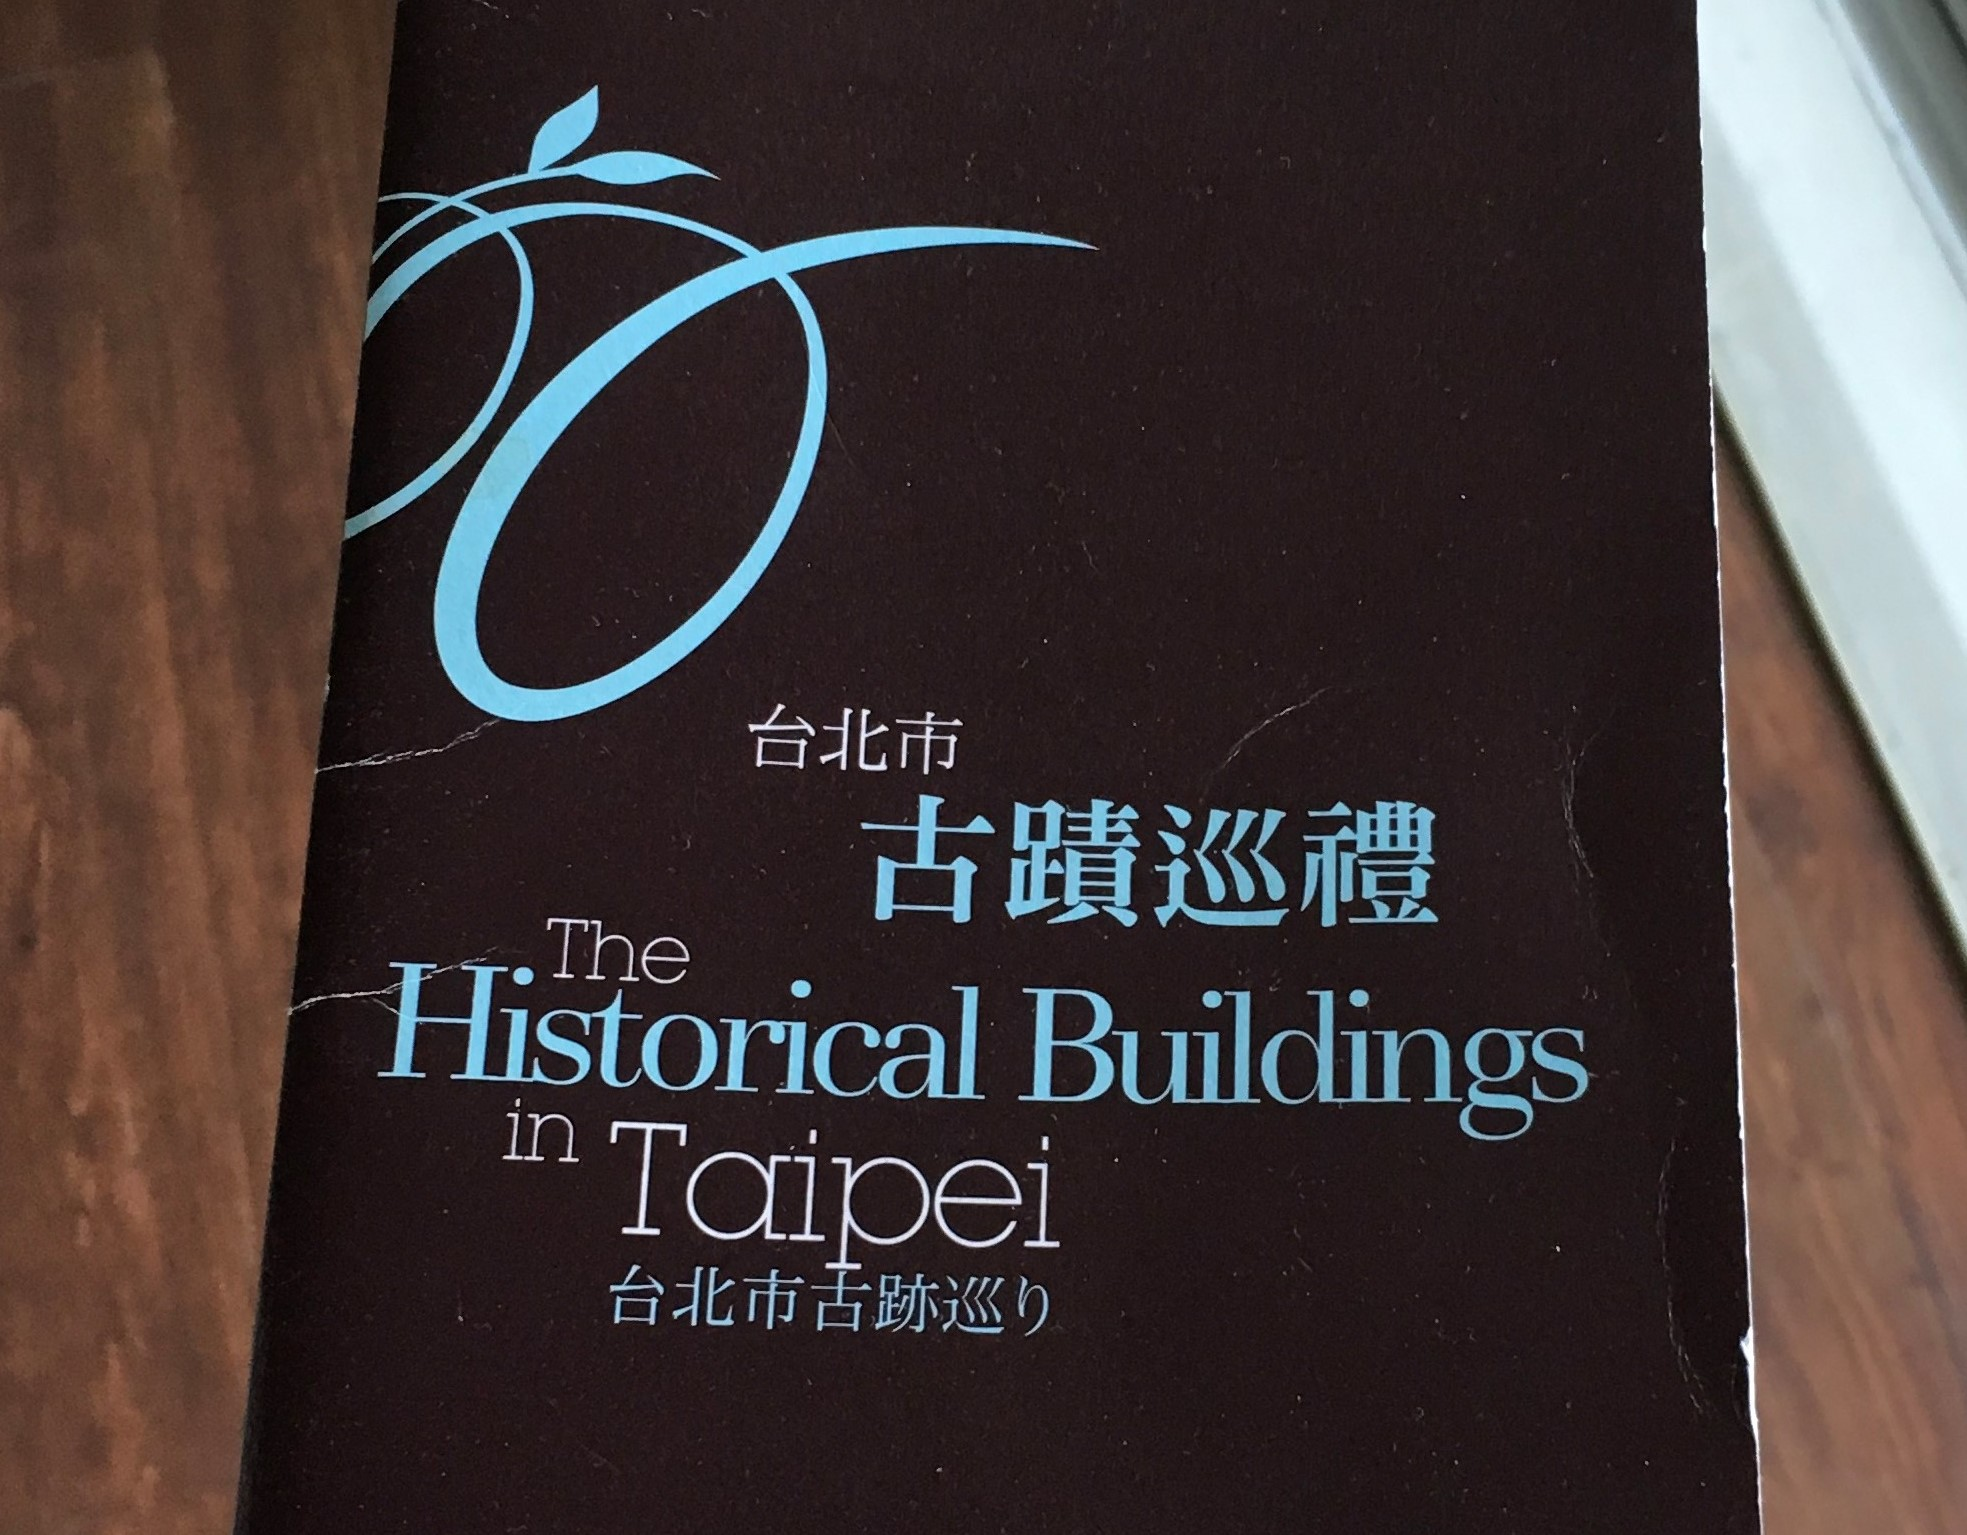 Sheraton Grand Taipei Historcial Buildings Brochure Taiwan © Flyga Twiga LLC